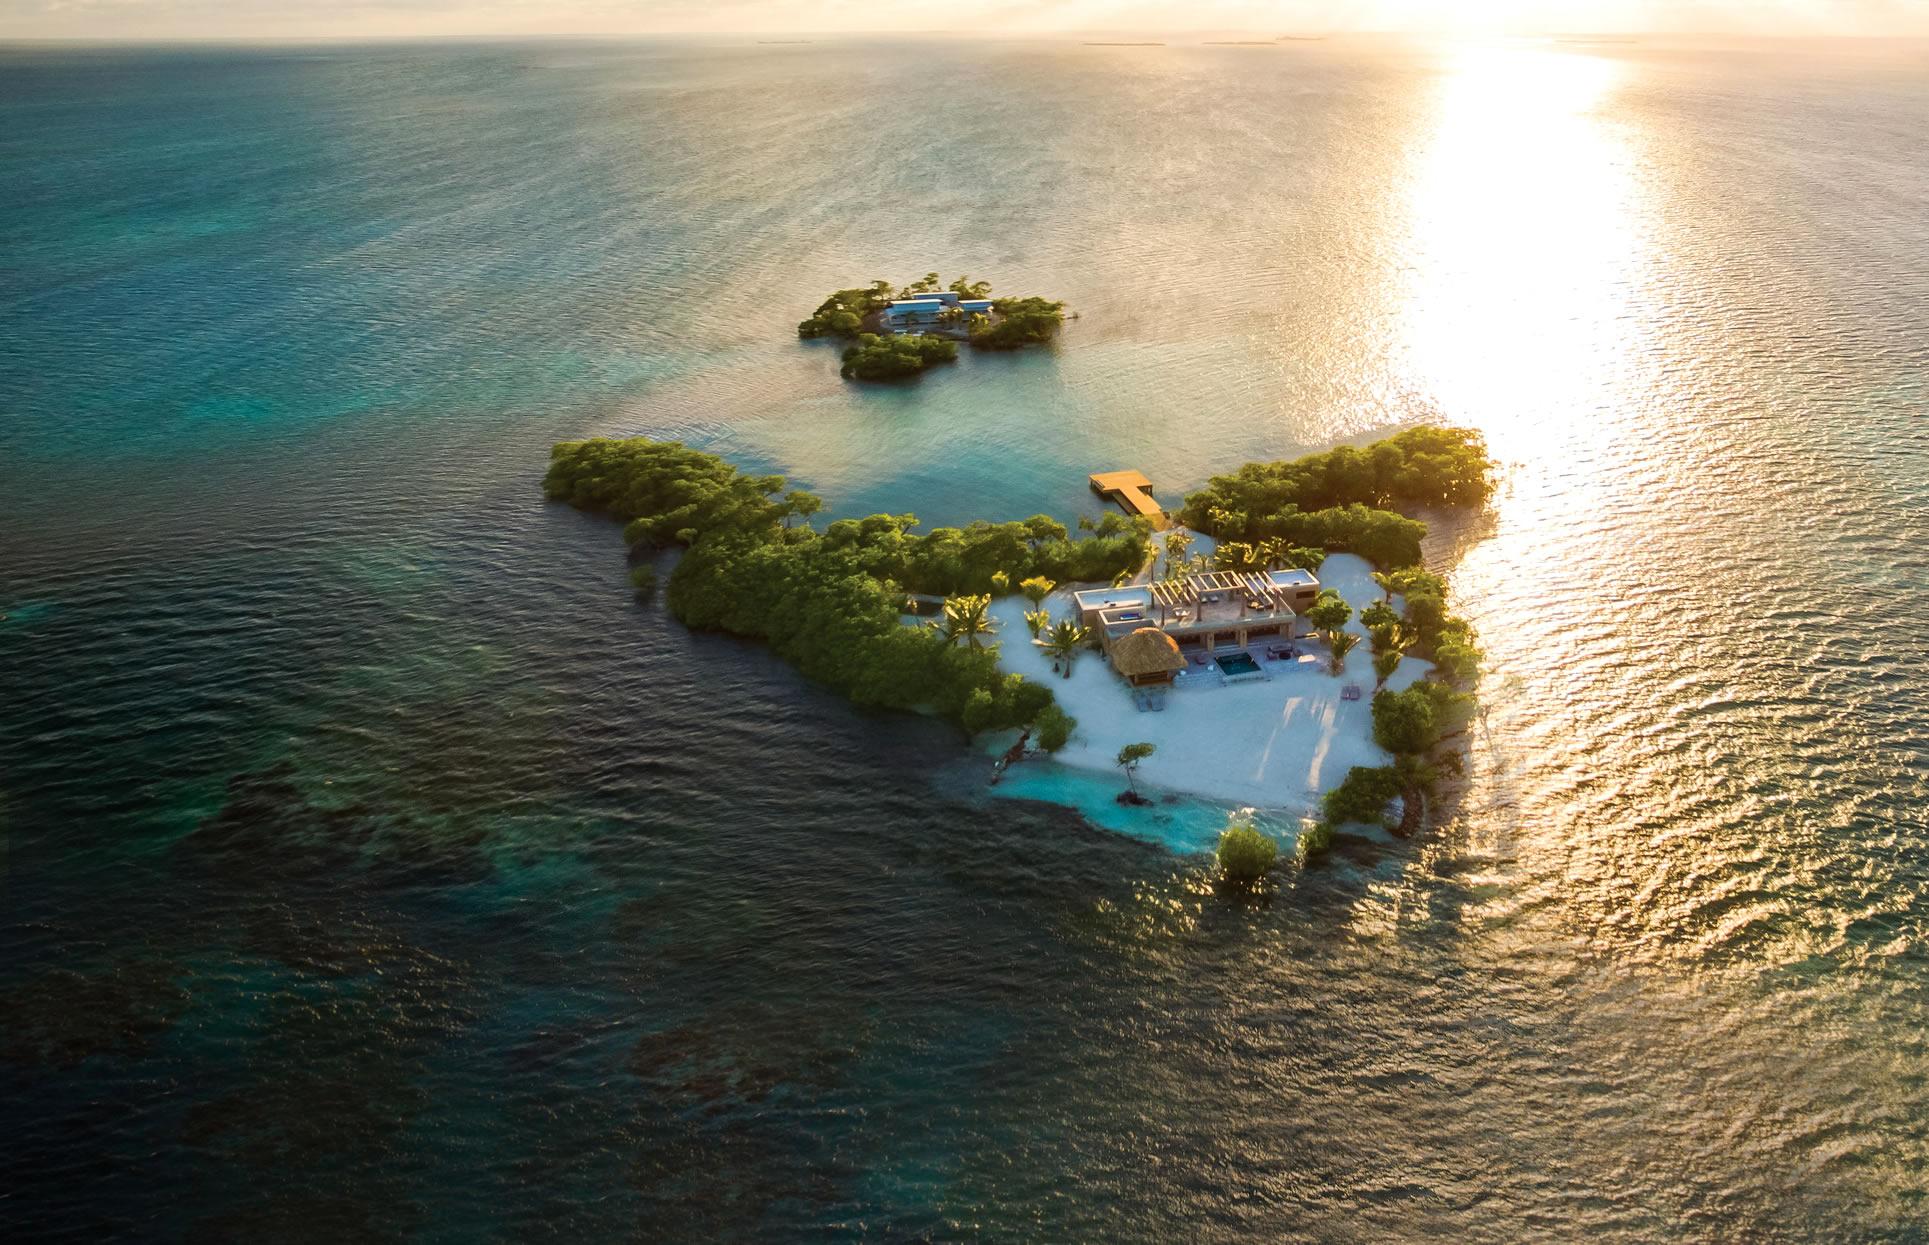 Kanu Private Island